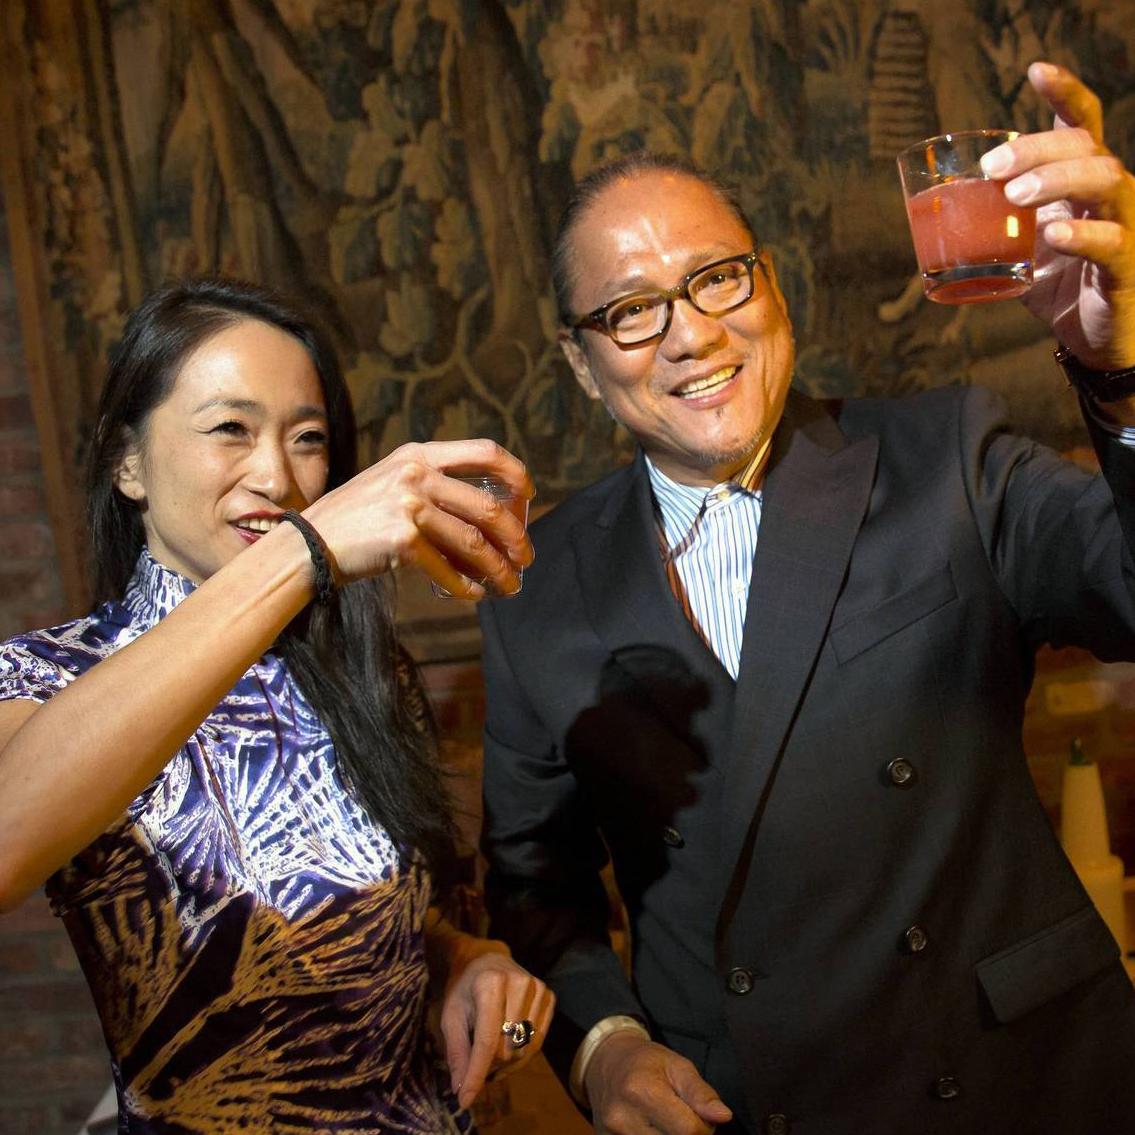 Danielle Chang and Masaharu Morimoto